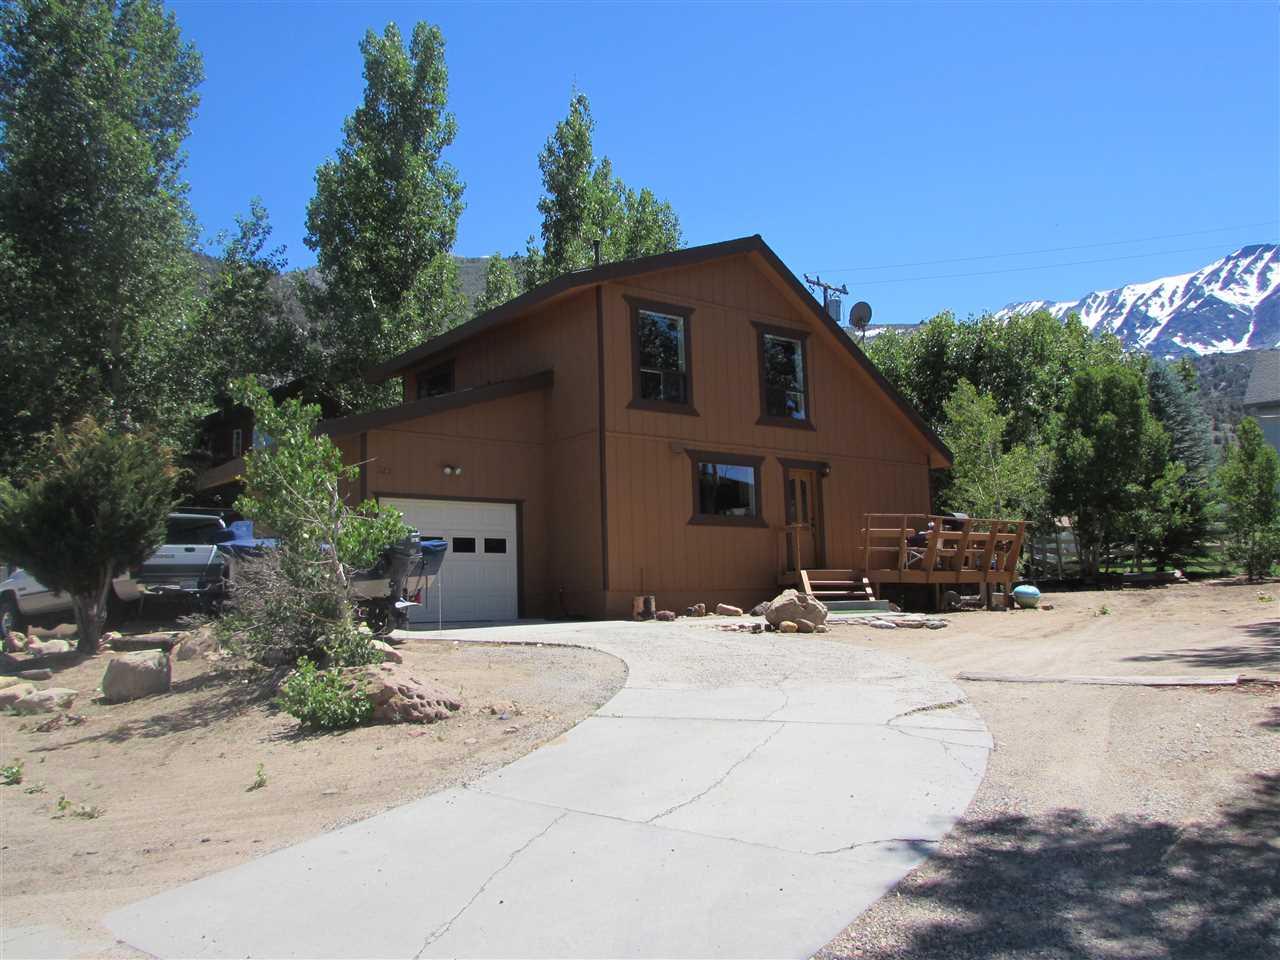 123 South Landing Road, Crowley Lake, CA 93546